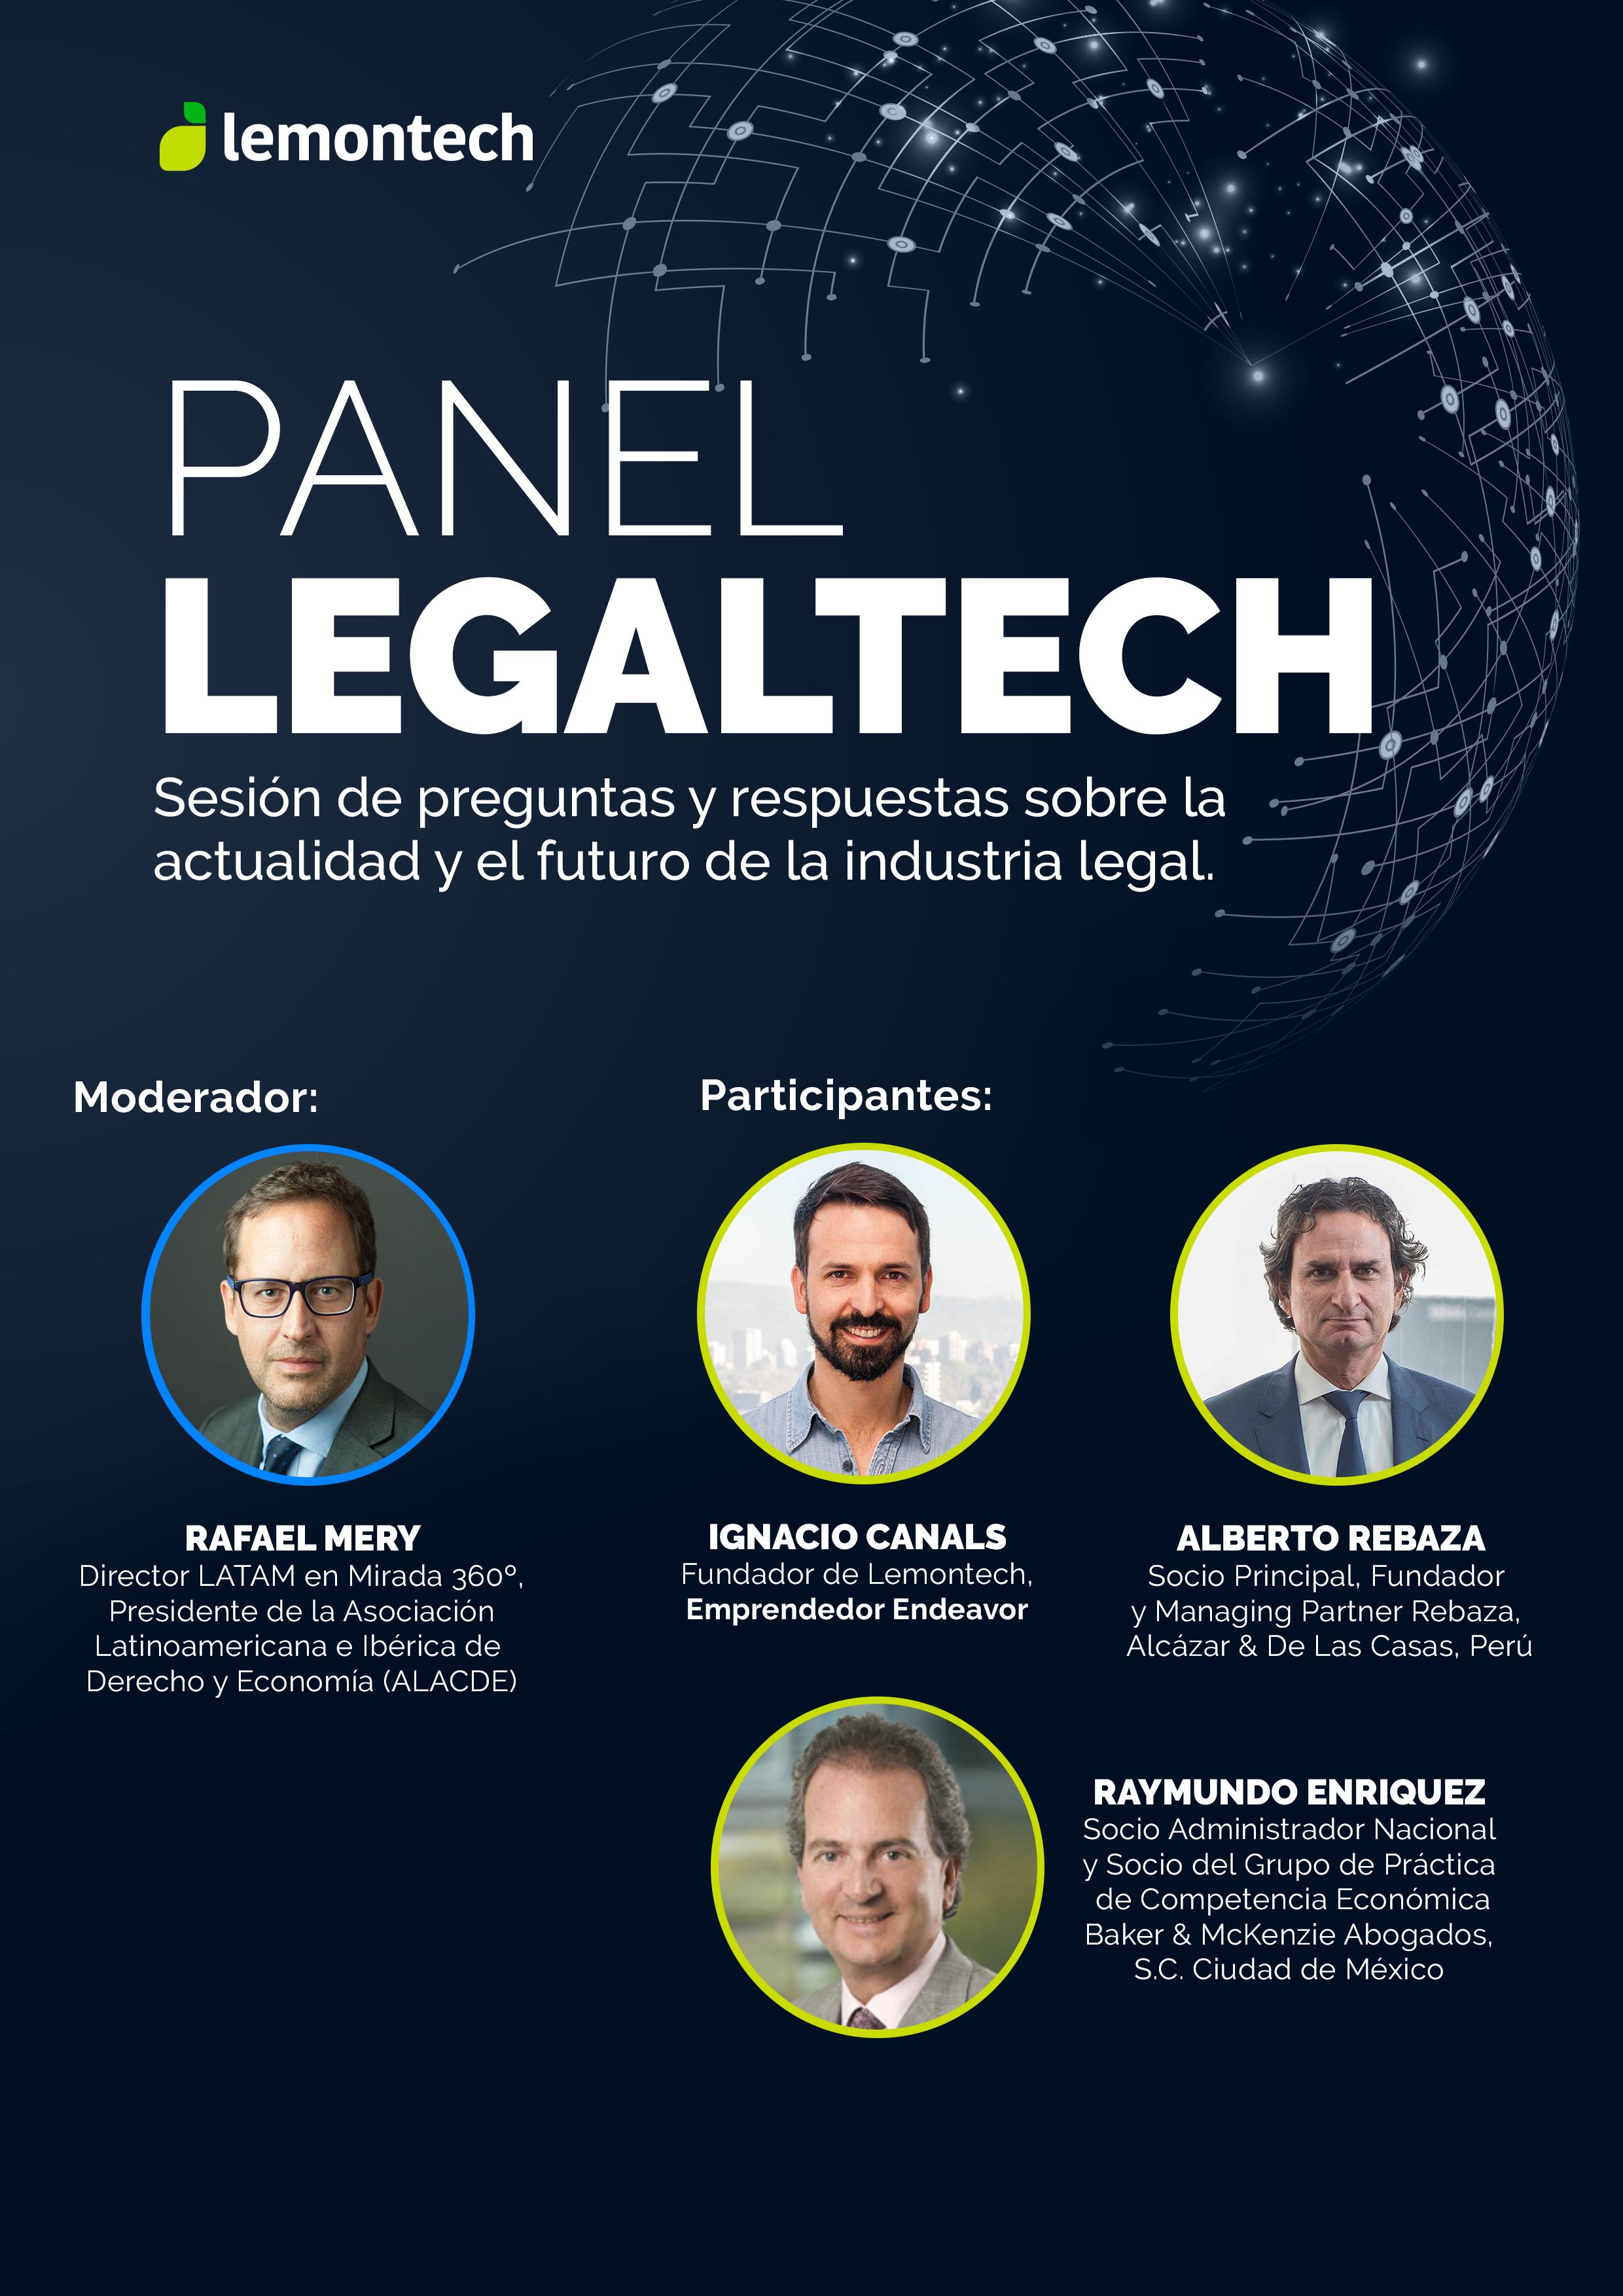 Panel Legaltech